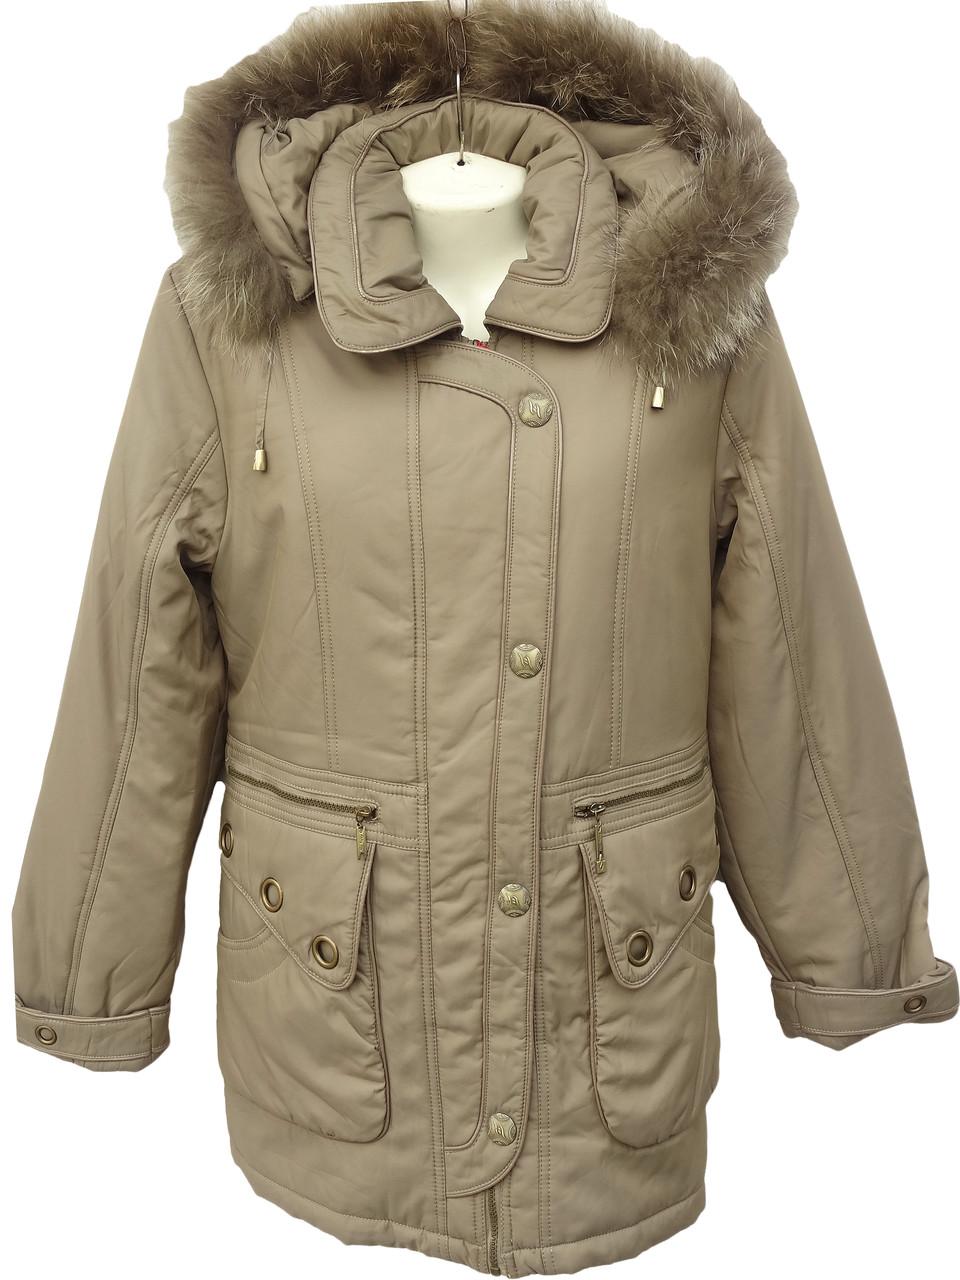 Зимняя куртка женская размер 52